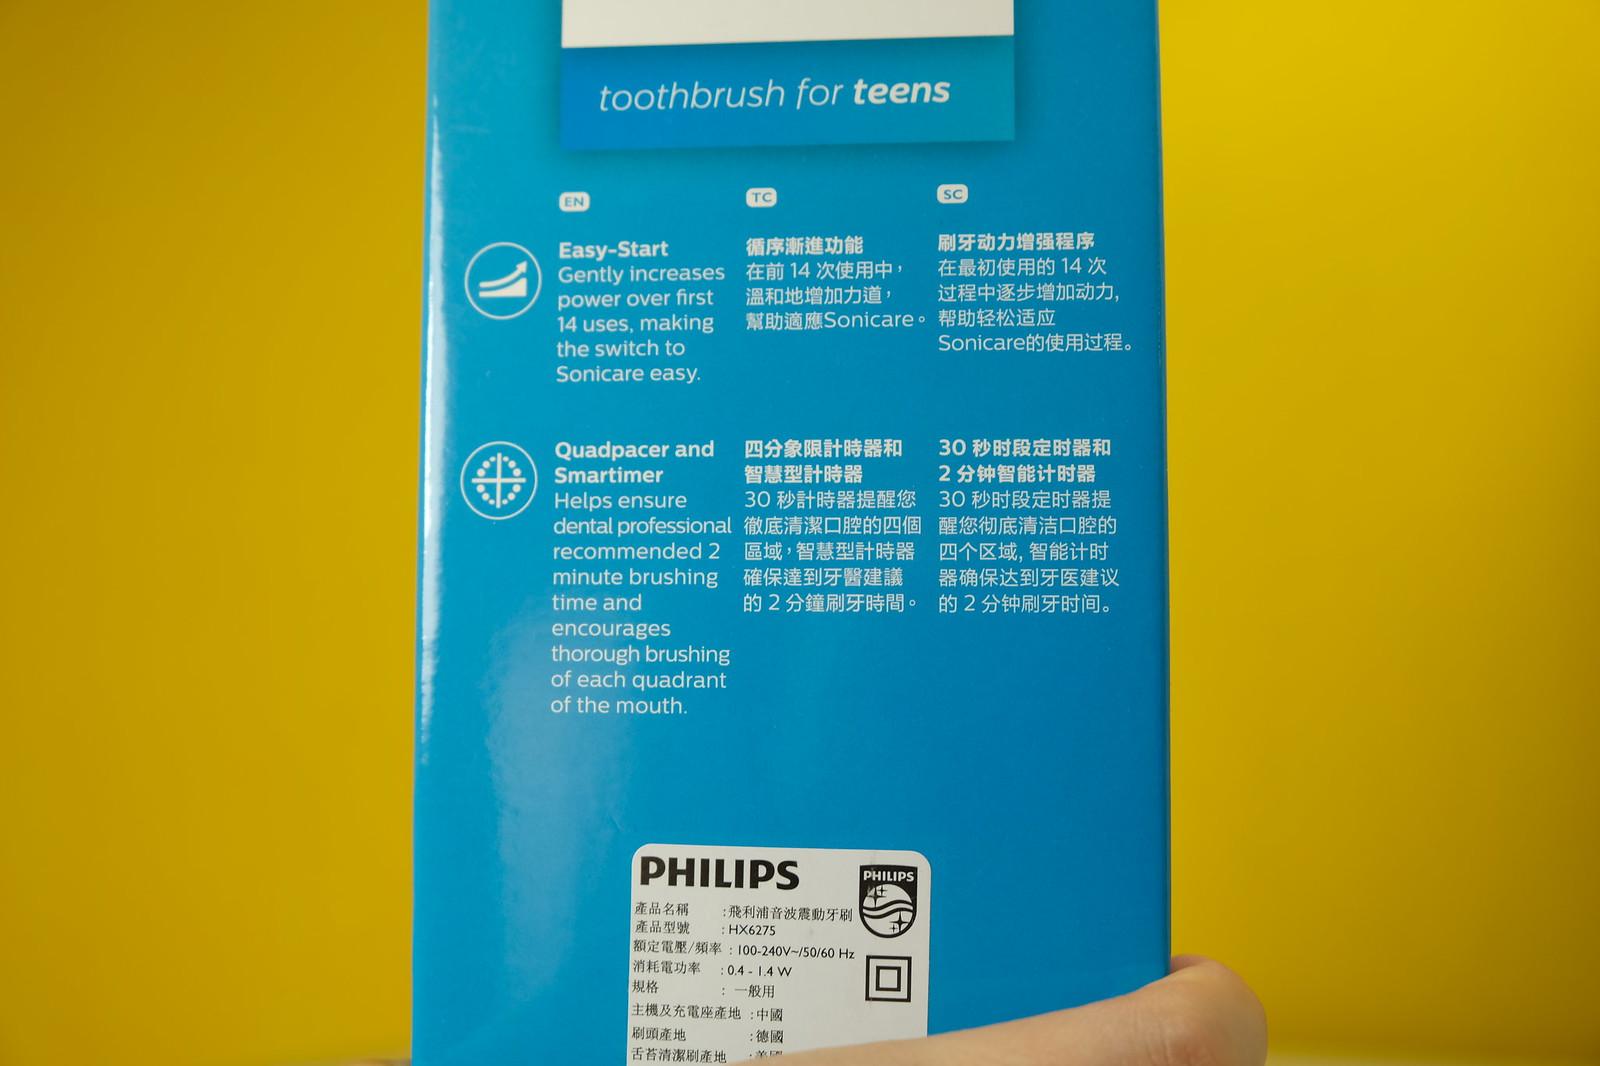 PHILIPS飛利浦 Sonicare 音波震動牙刷外盒功能說明